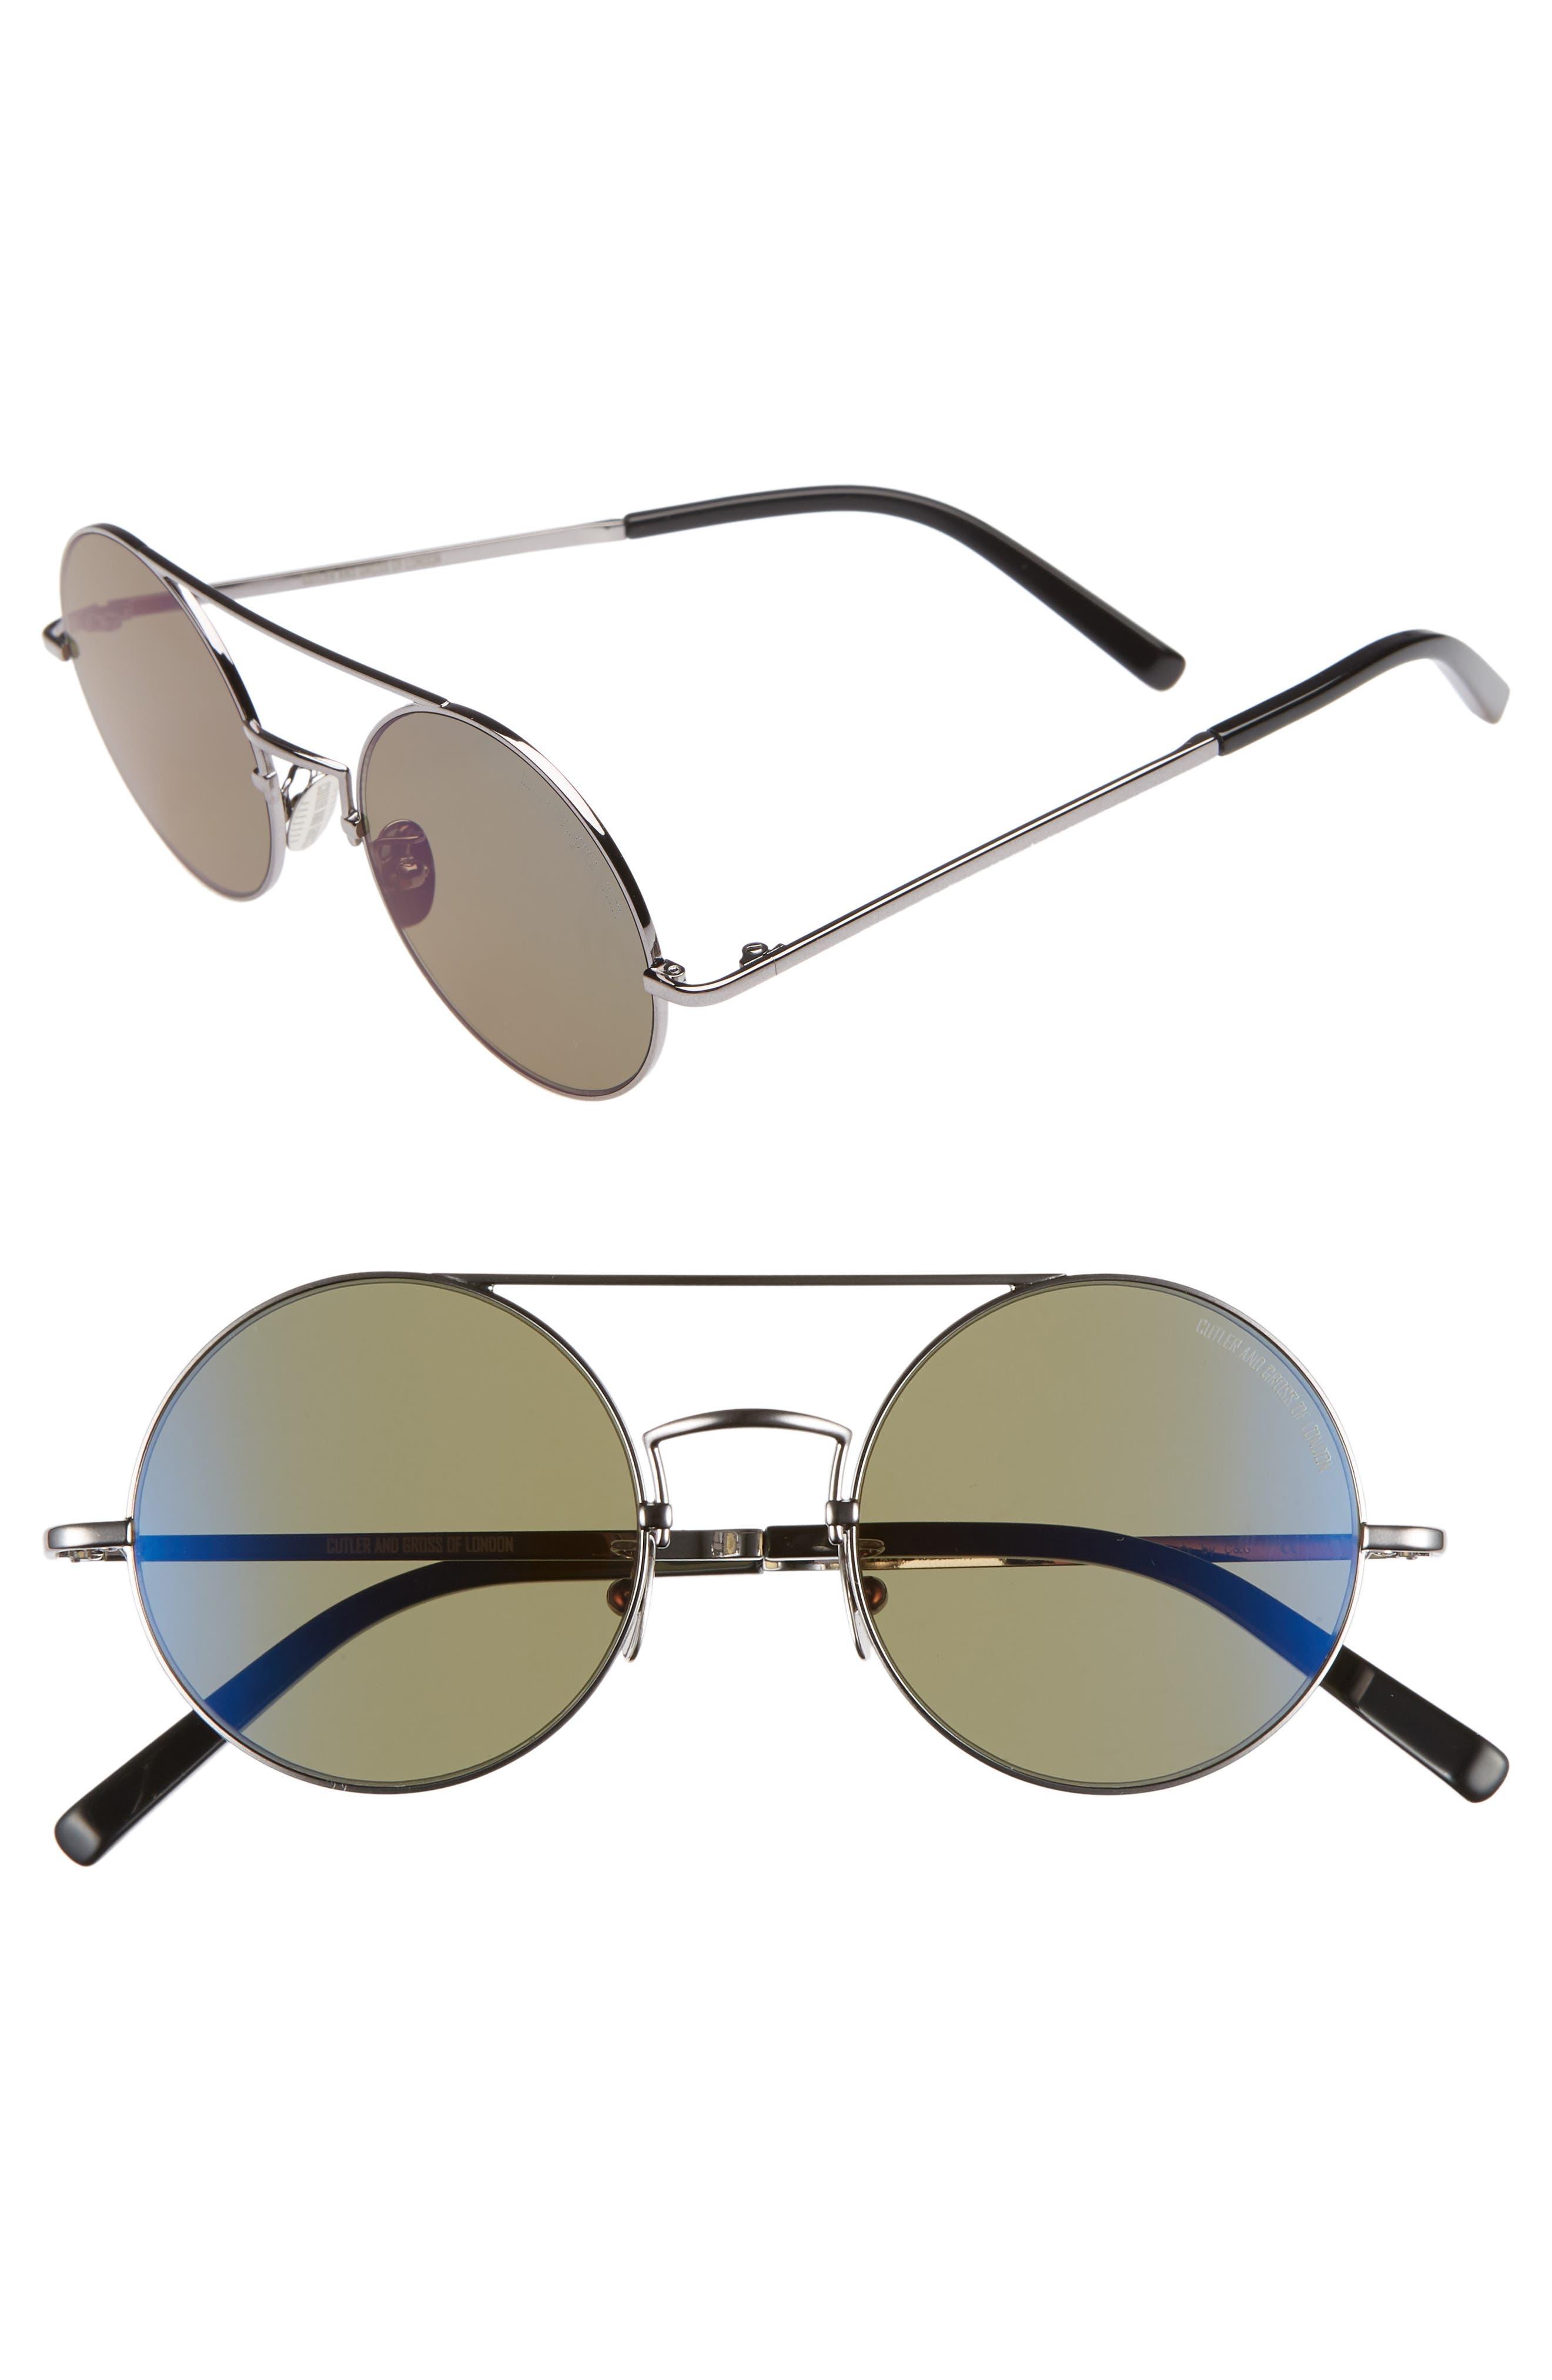 49mm Polarized Round Sunglasses,                             Main thumbnail 1, color,                             RUTHENIUM METAL/ DARK GREEN